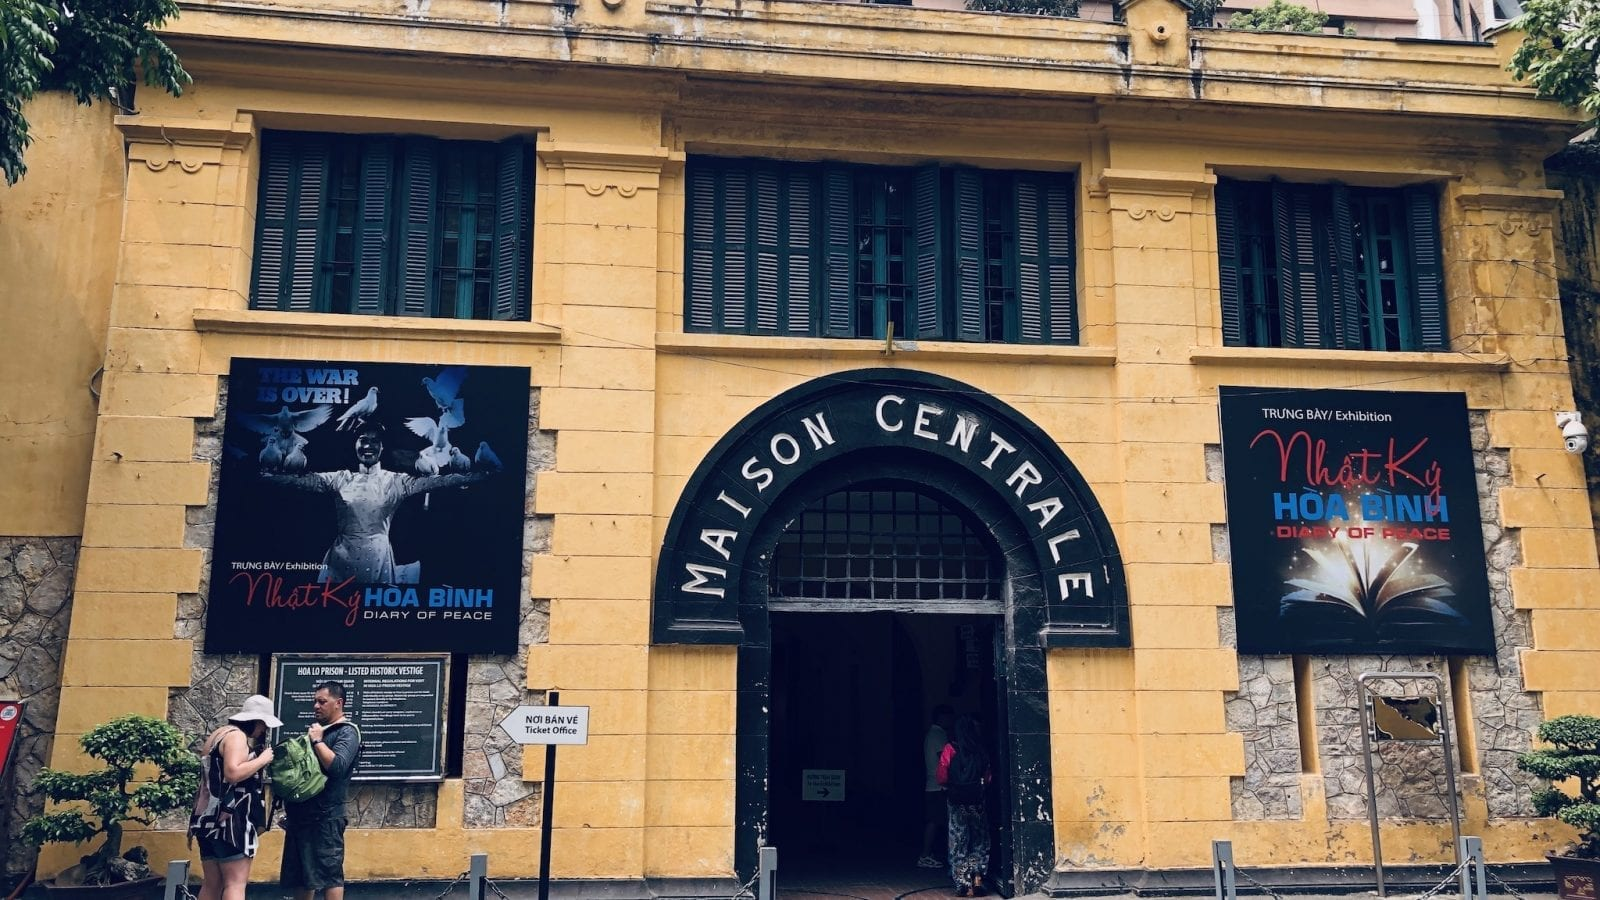 Maison Centrale Hoa Lo Prison Hanoi